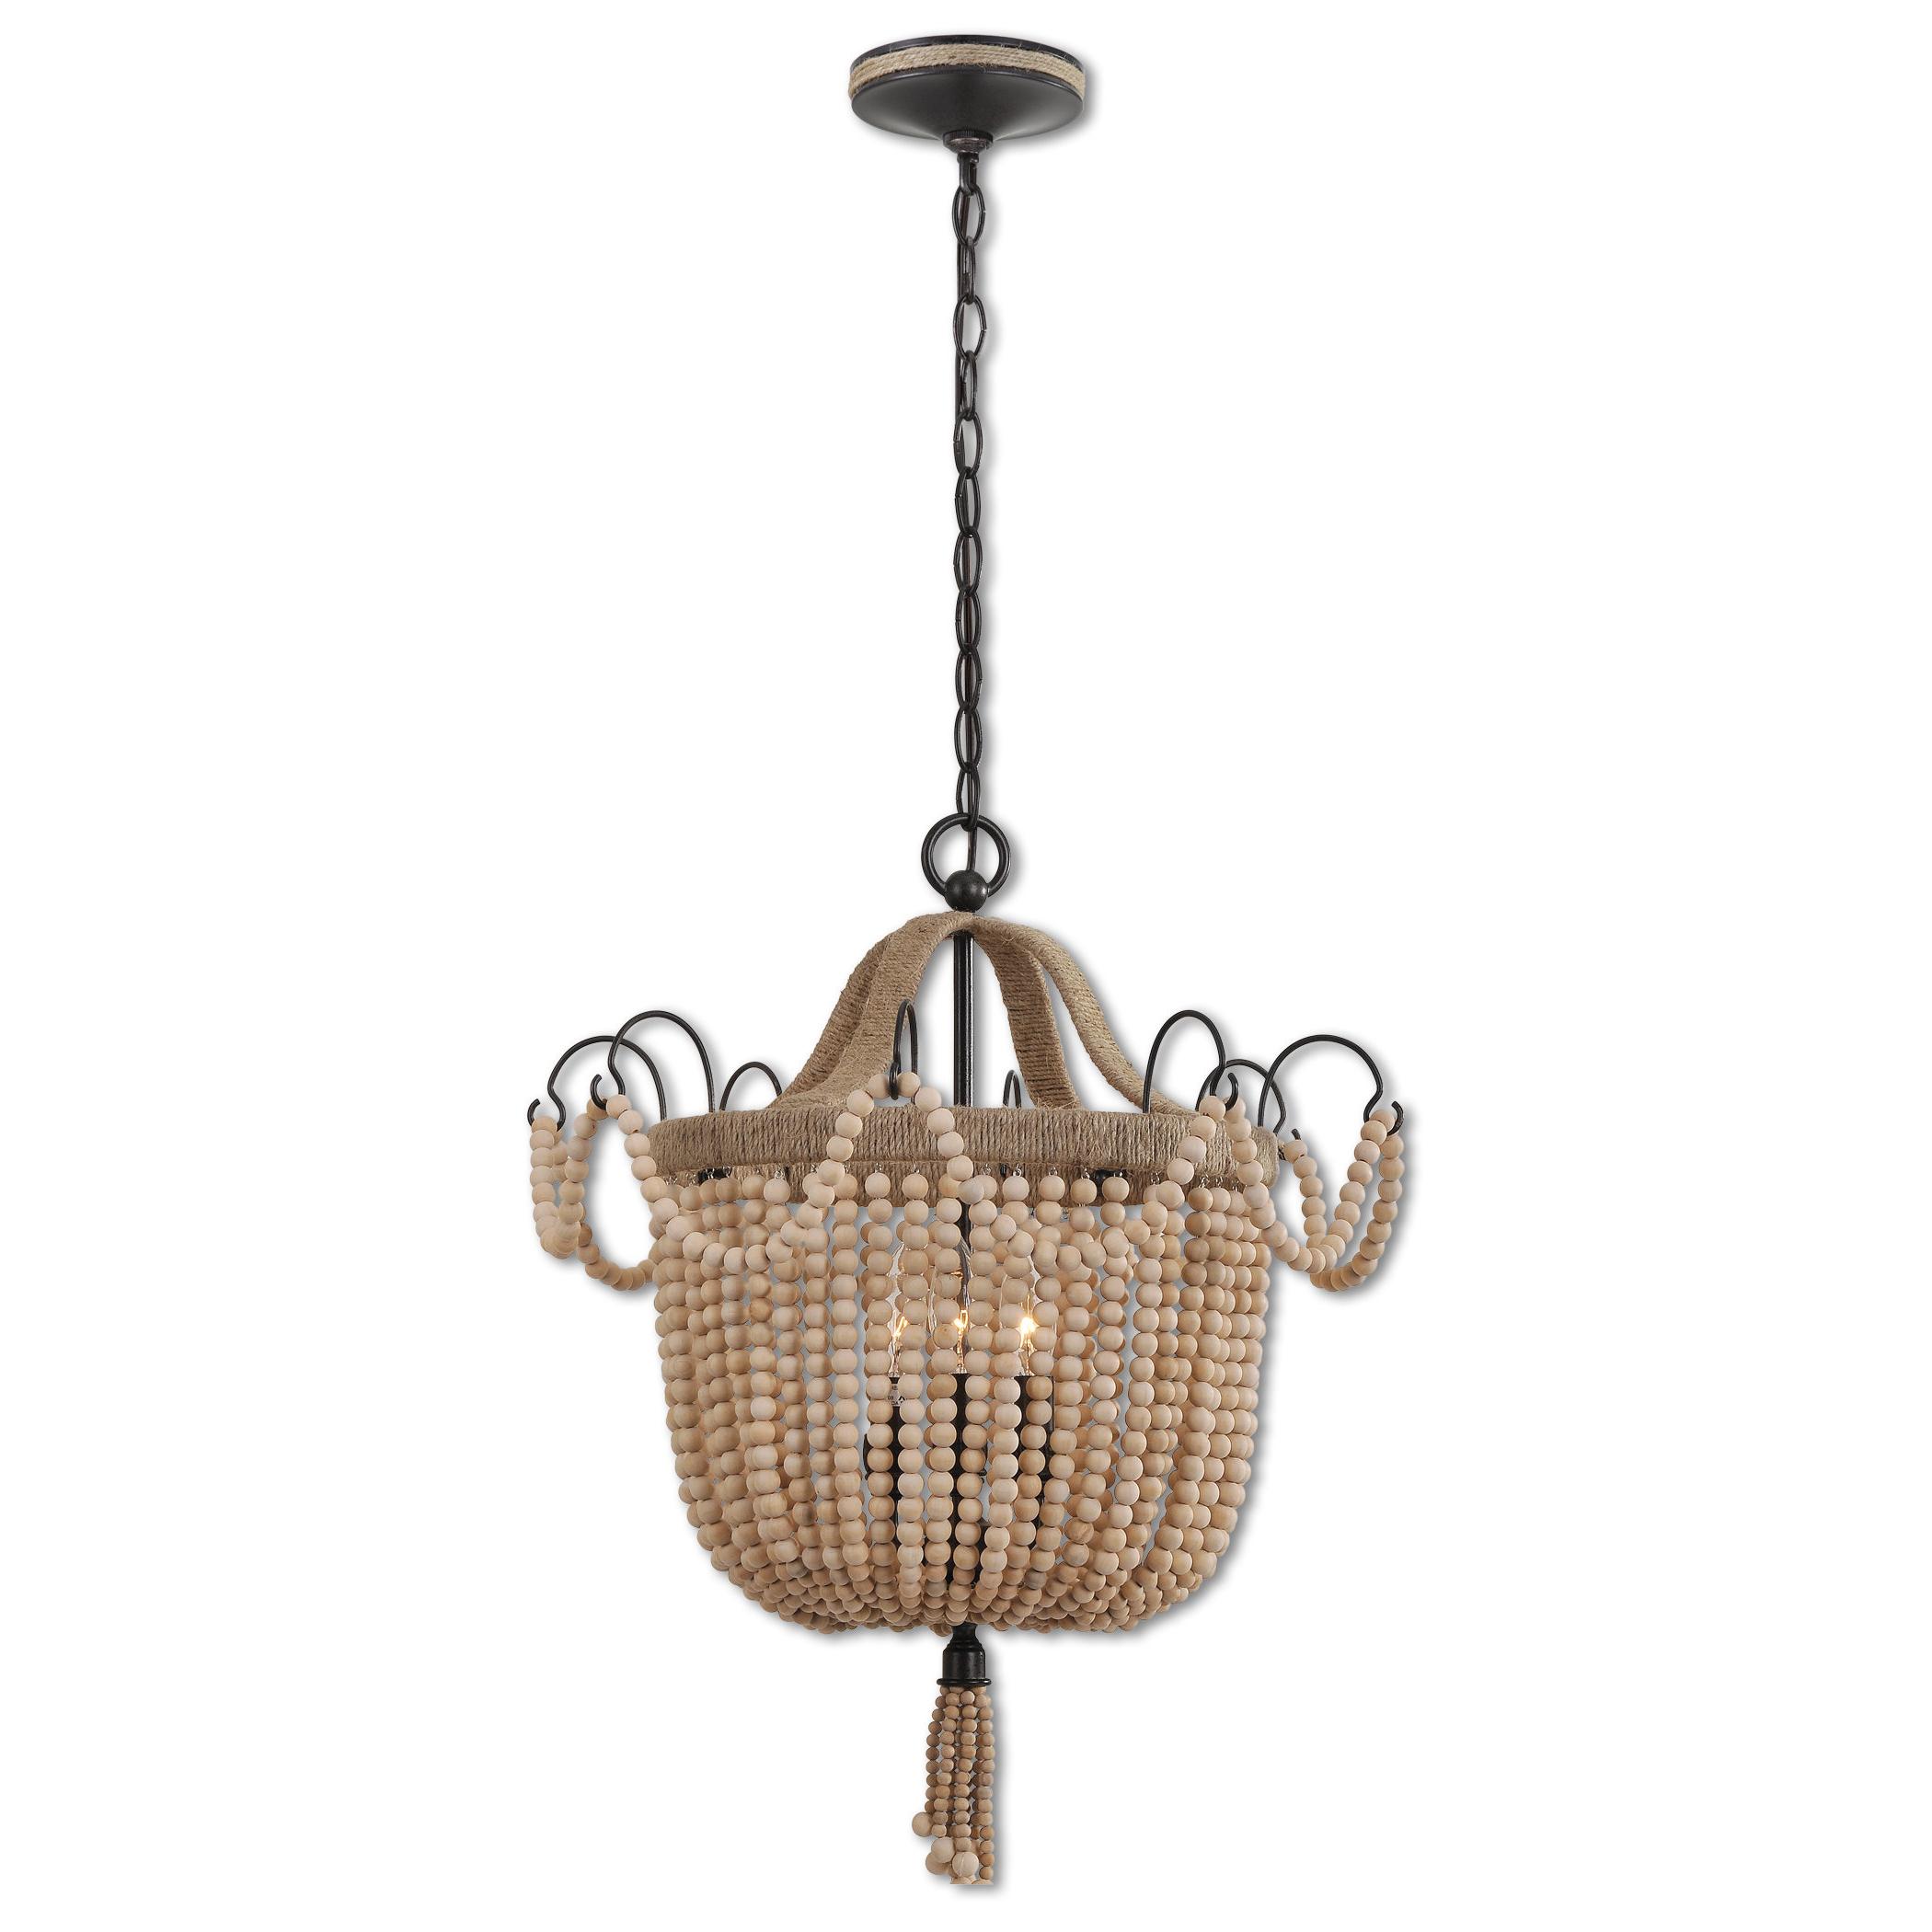 Most Recently Released Verla 3 Light Lantern Bowl Pendant Inside Armande 3 Light Lantern Geometric Pendants (View 10 of 25)